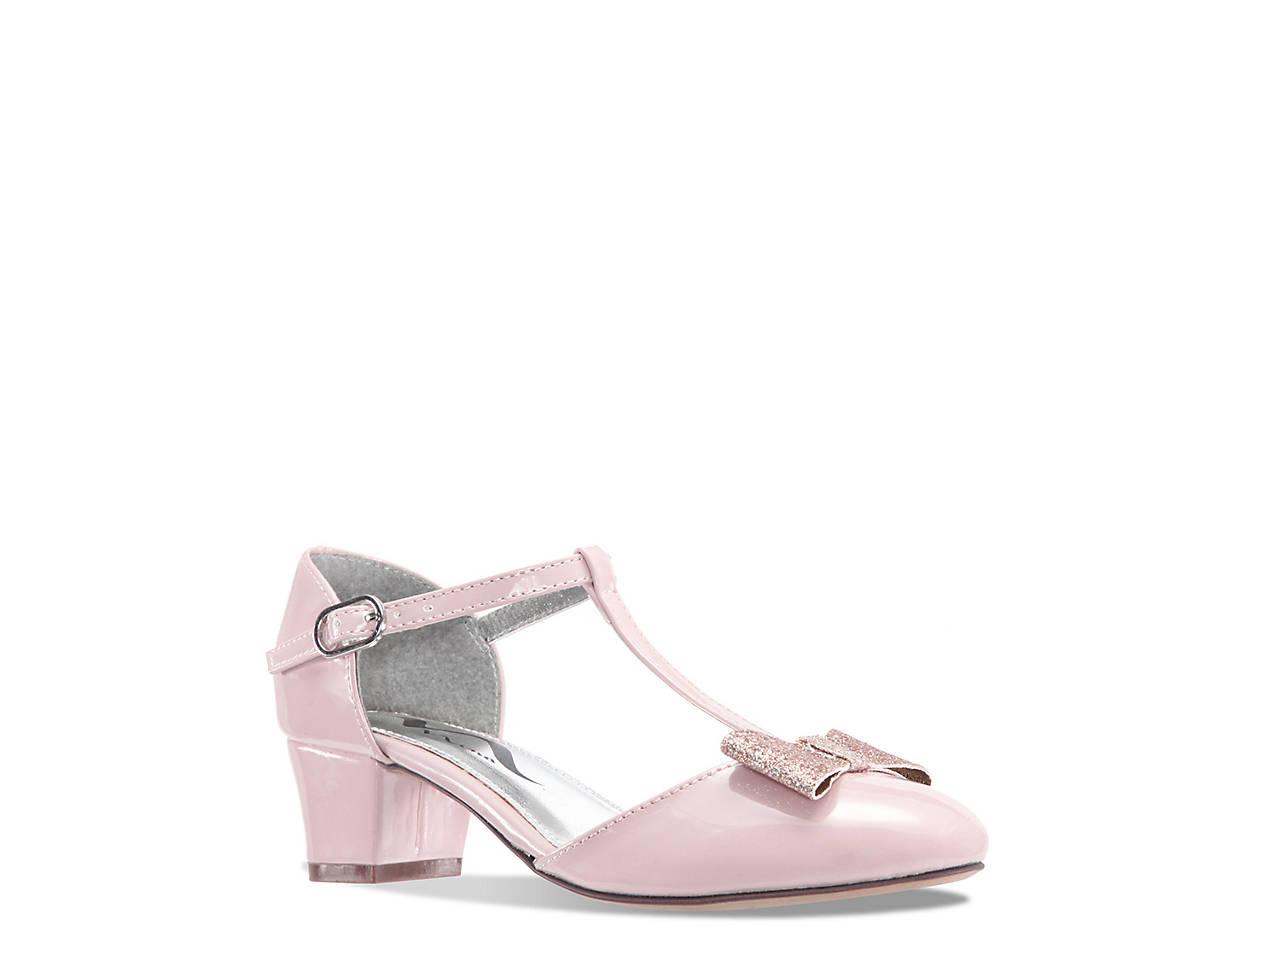 21a54376d Nina Myra Youth Pump Kids Shoes